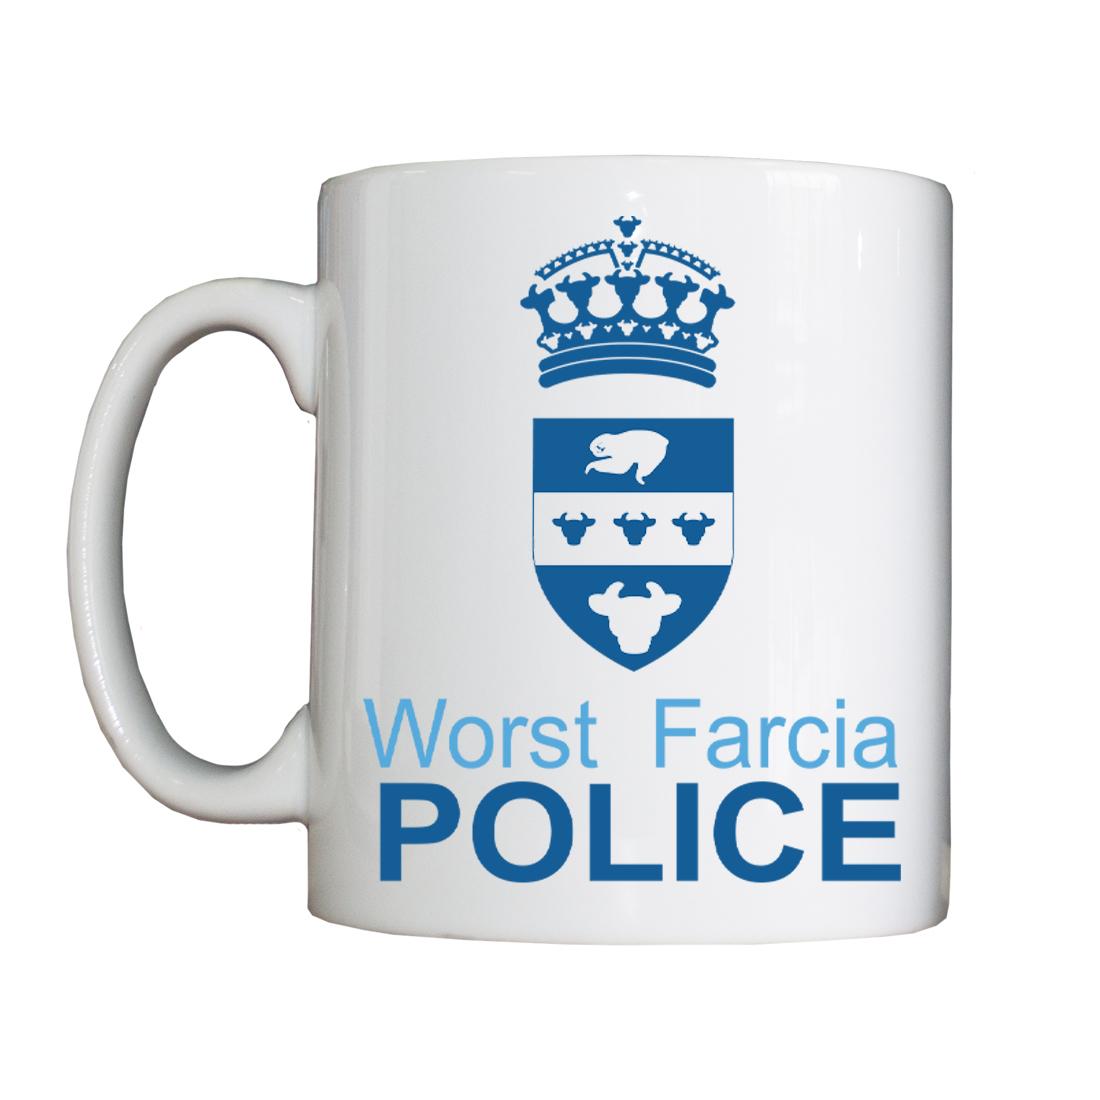 Personalised 'Worst Farcia' Drinking Vessel (Mug) WorstFarciaMugForce